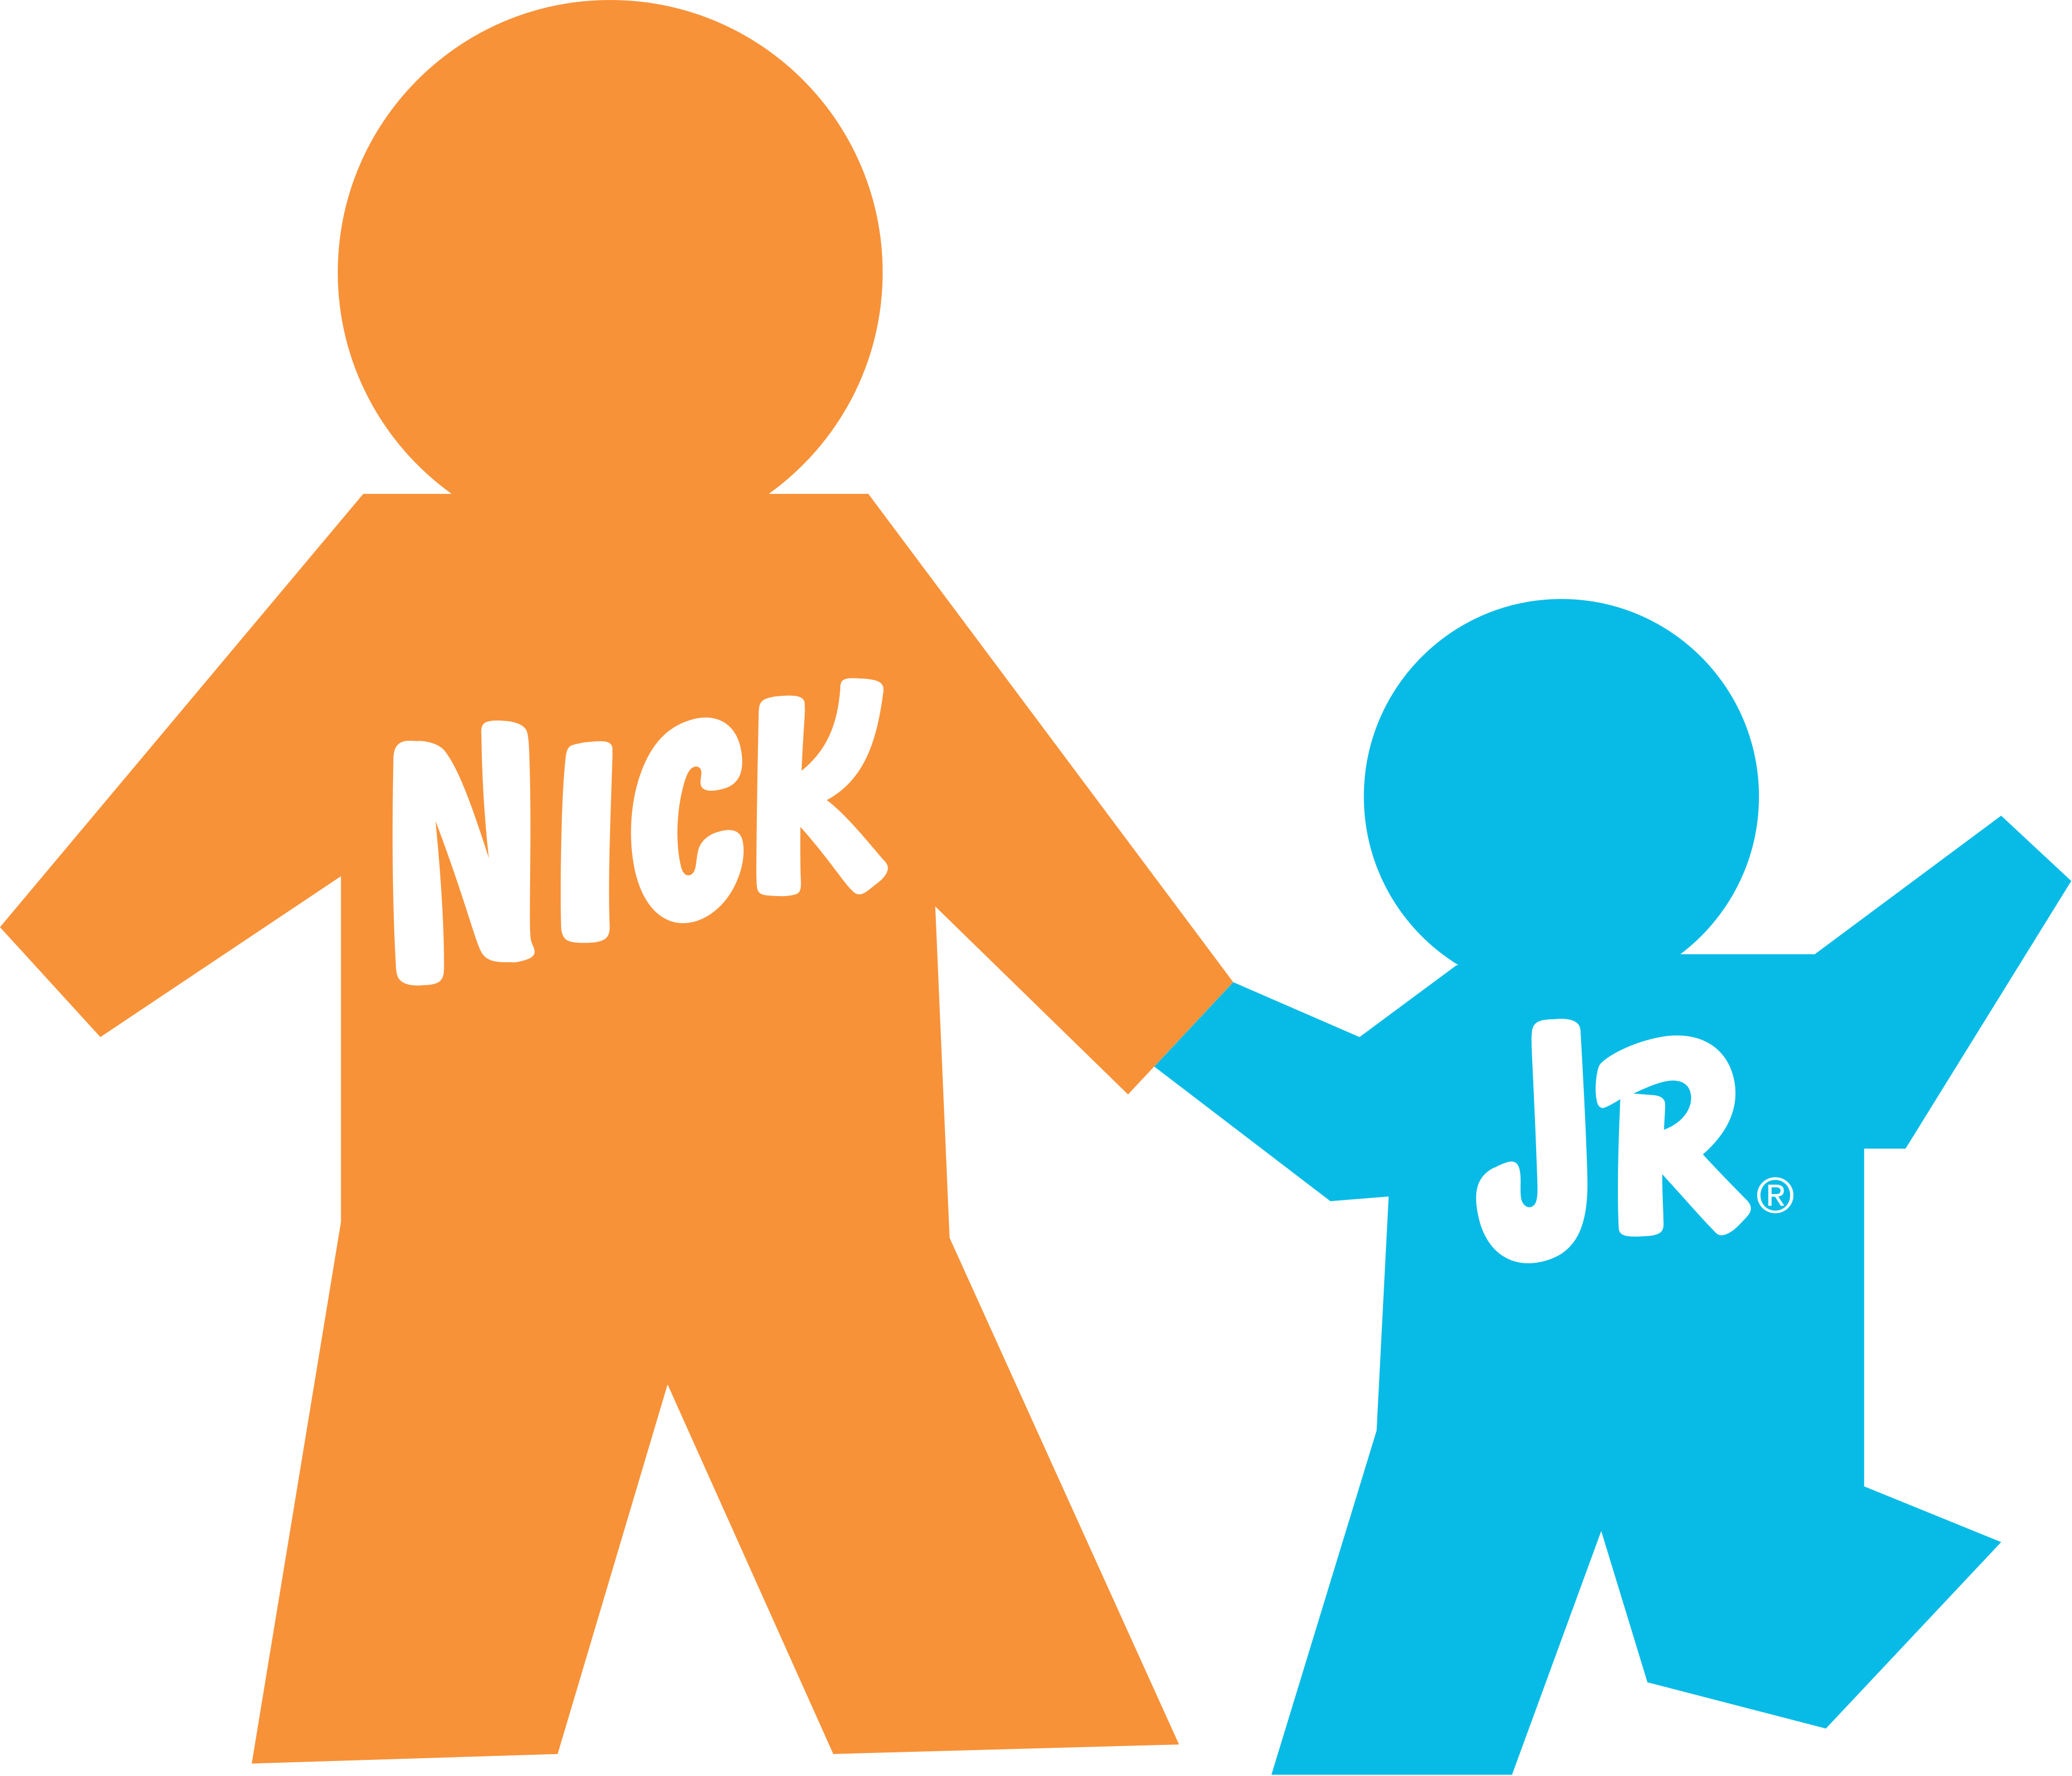 Avatar Movie Logo: Image - Nick Jr. OLd Logo.png